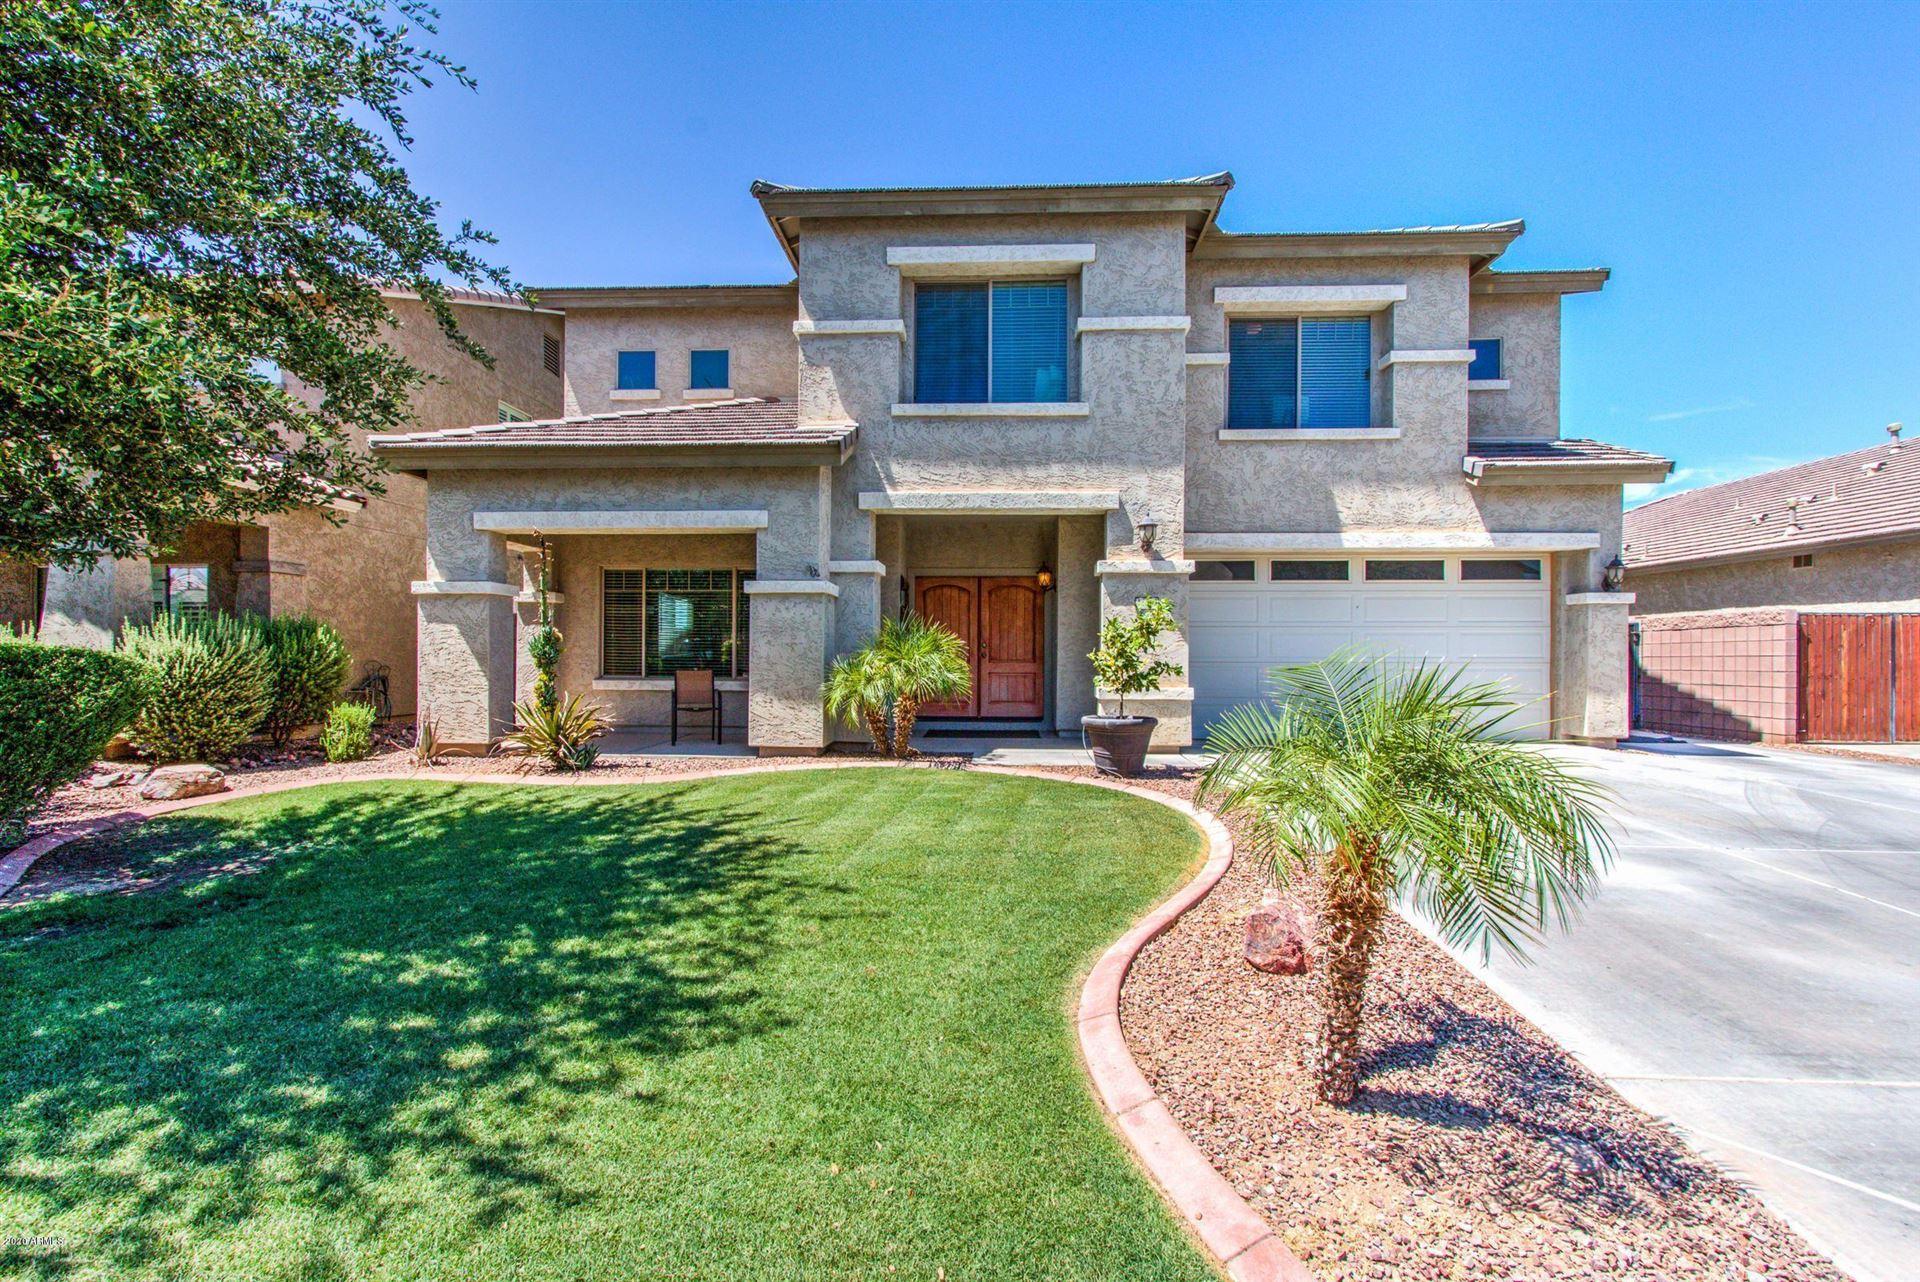 Photo for 44362 W ADOBE Circle, Maricopa, AZ 85139 (MLS # 6155122)